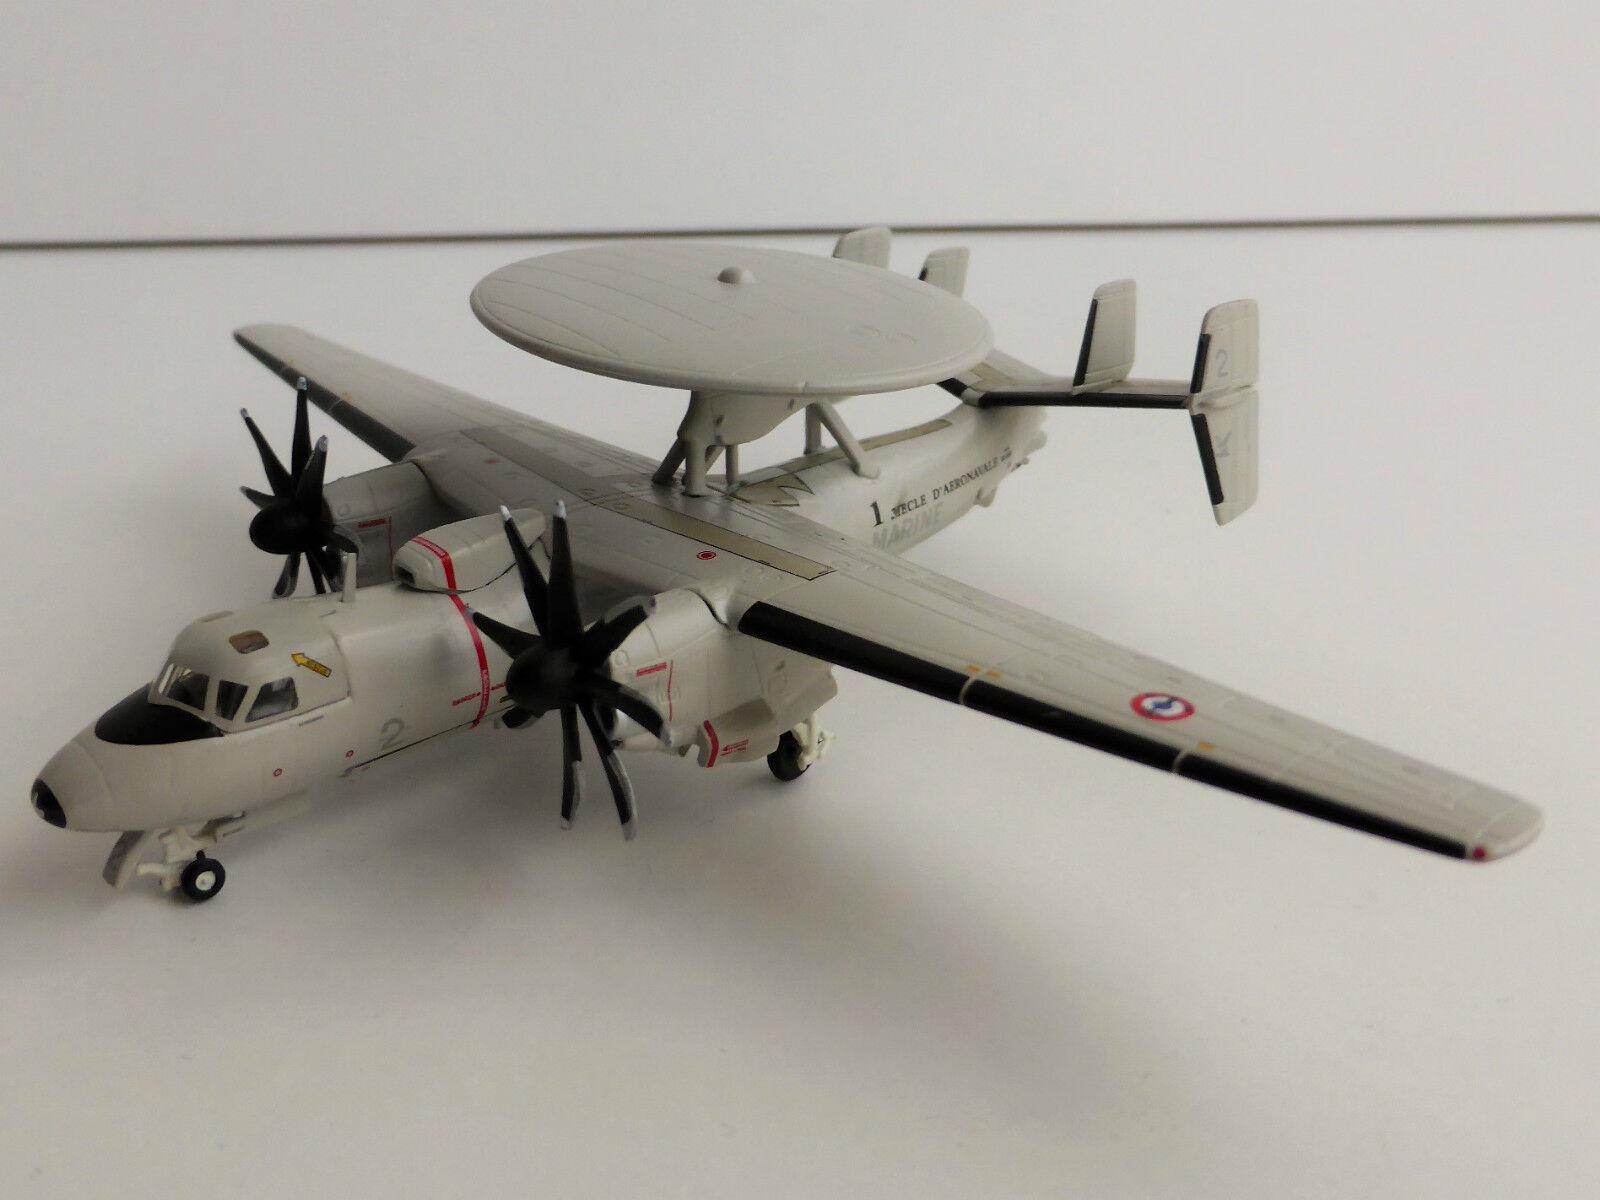 Grumman e-2c Hawkeye French Navy Marine Flotille 4 1 200 Herpa 556675 e-2